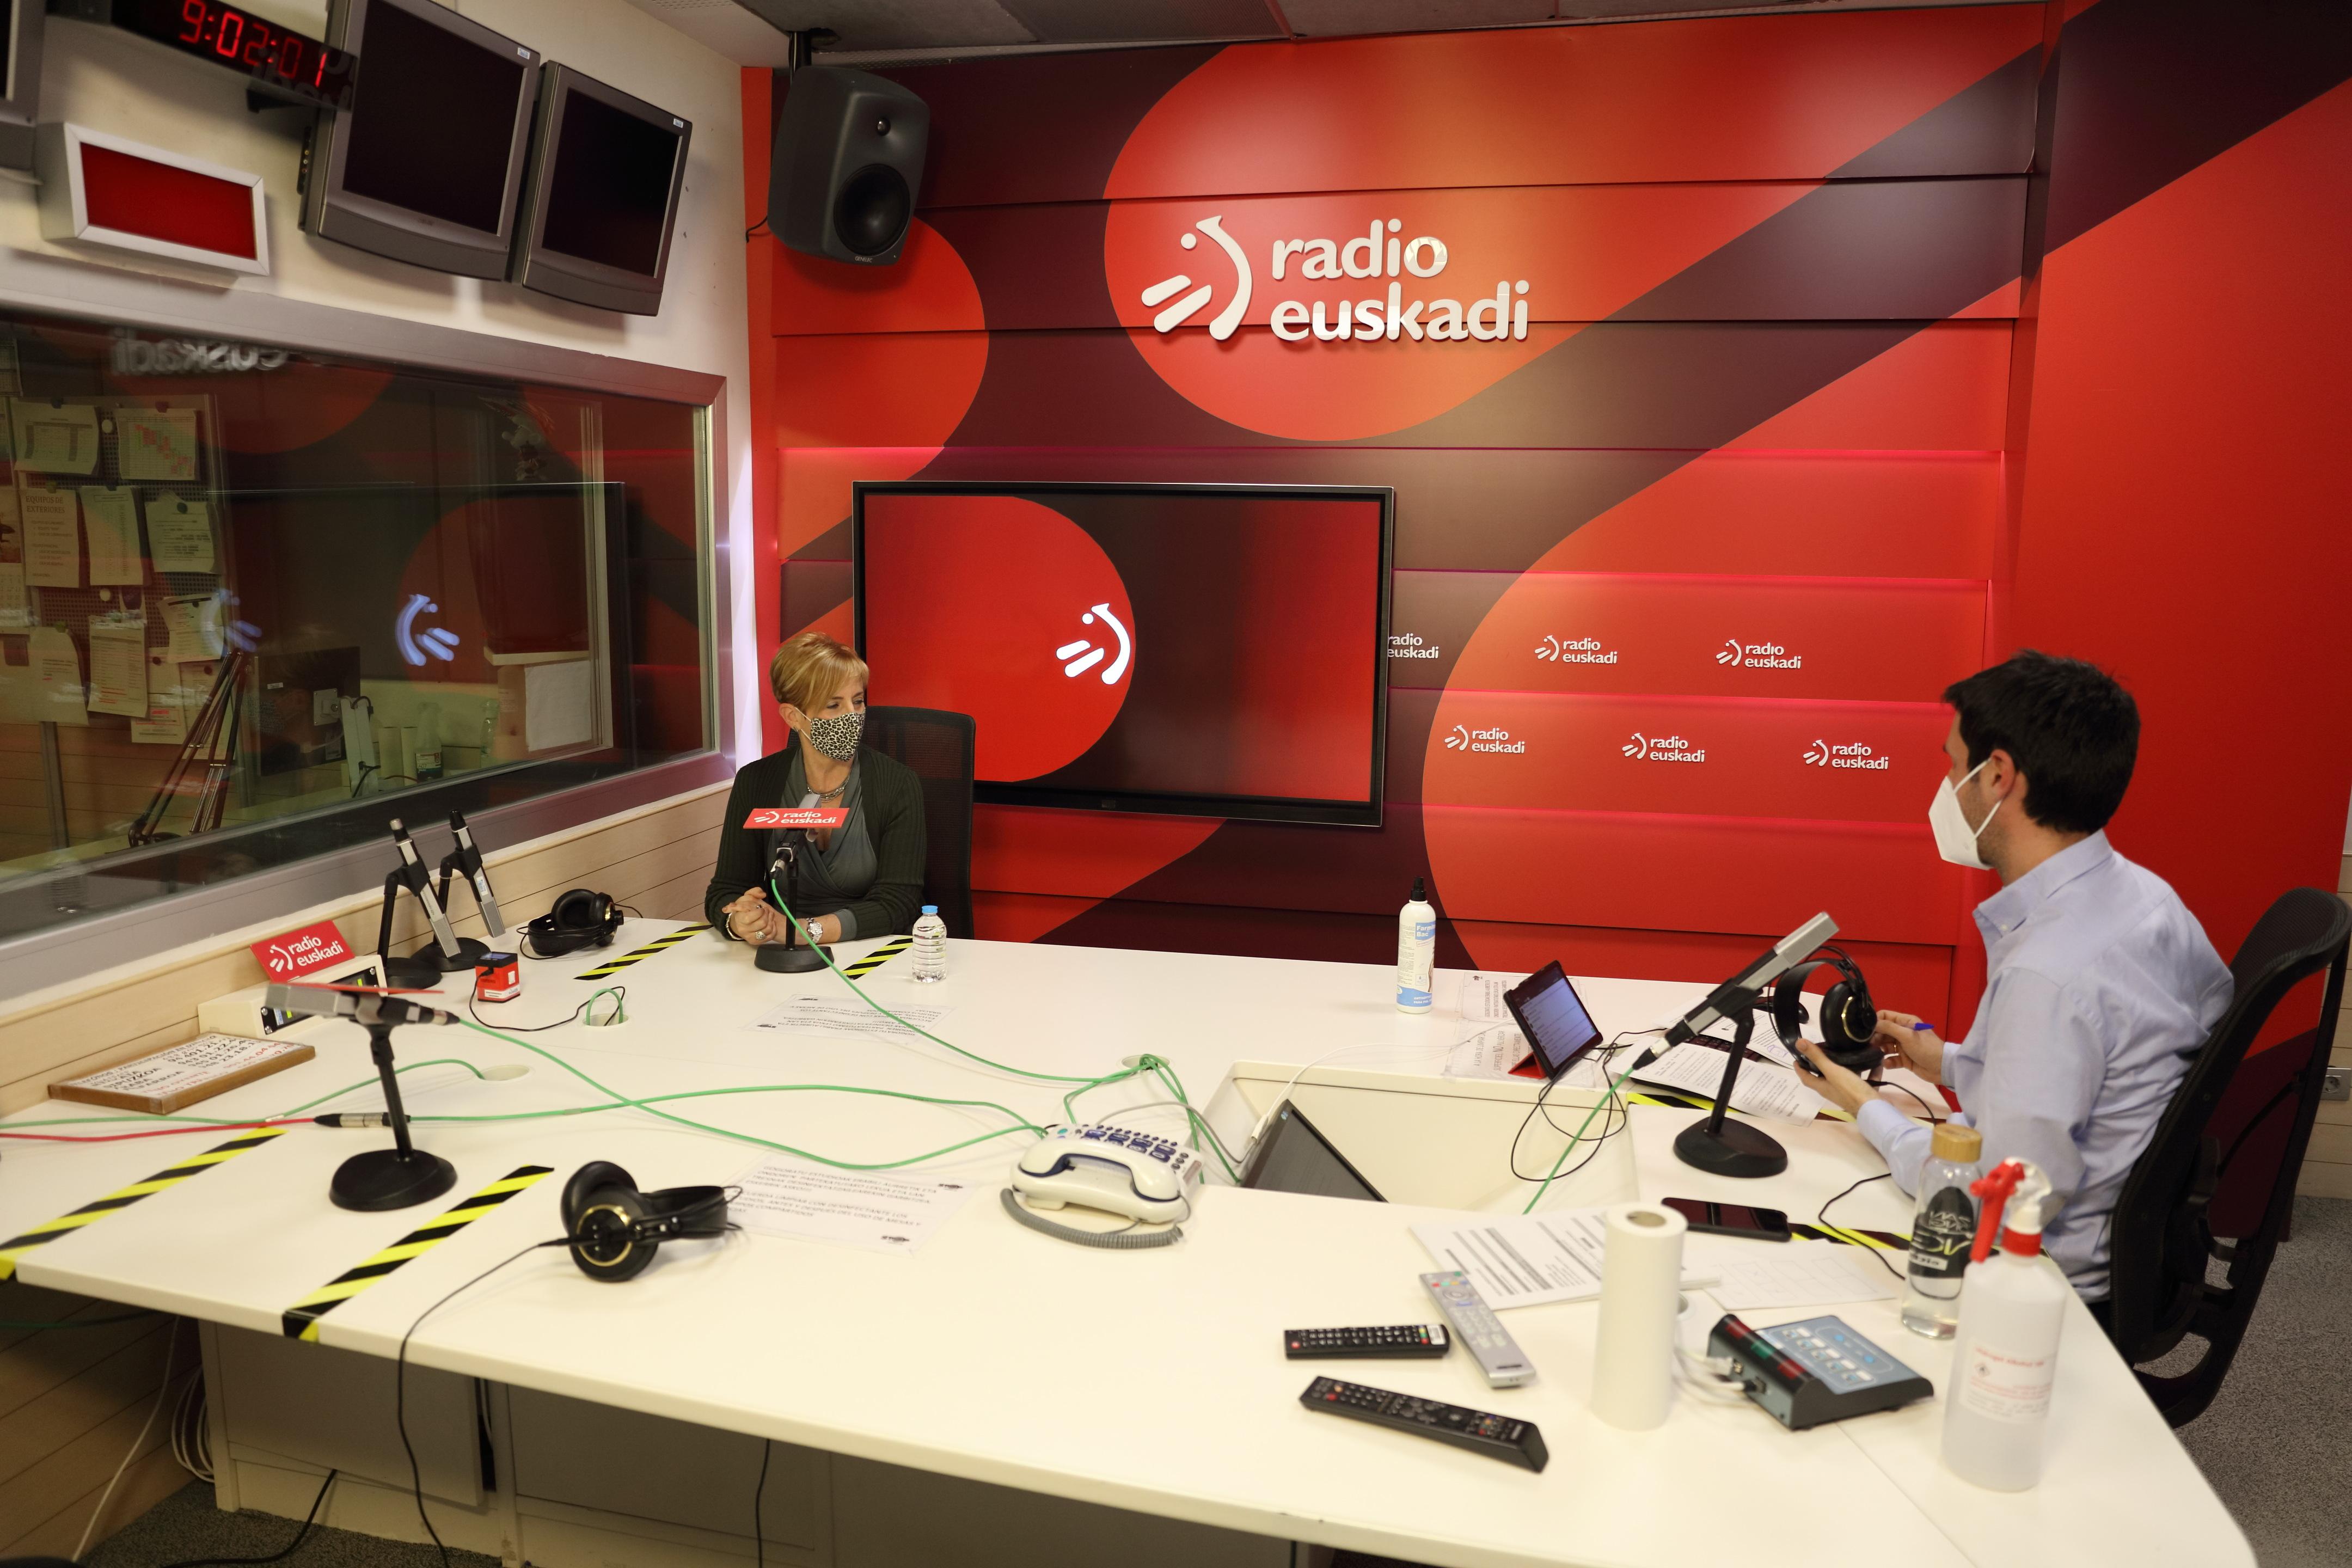 RadioEuskad_i002.JPG